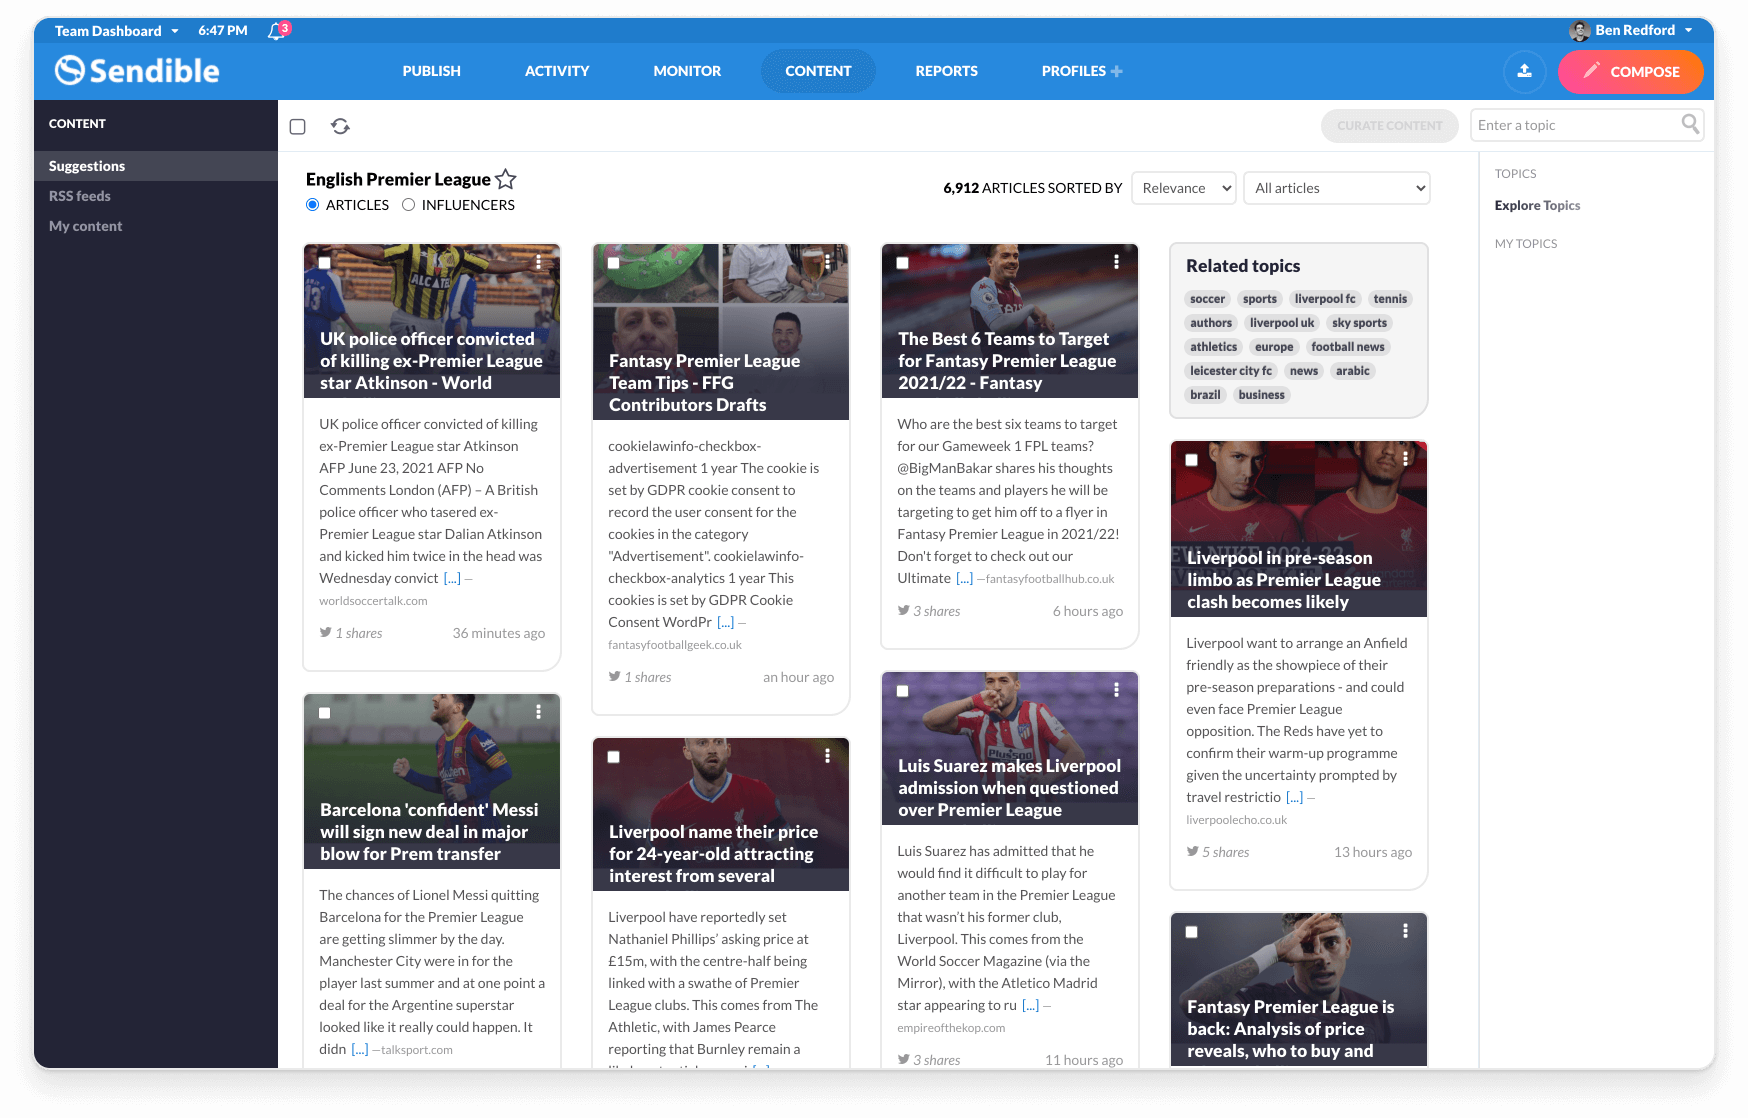 pub-07-content-suggestions